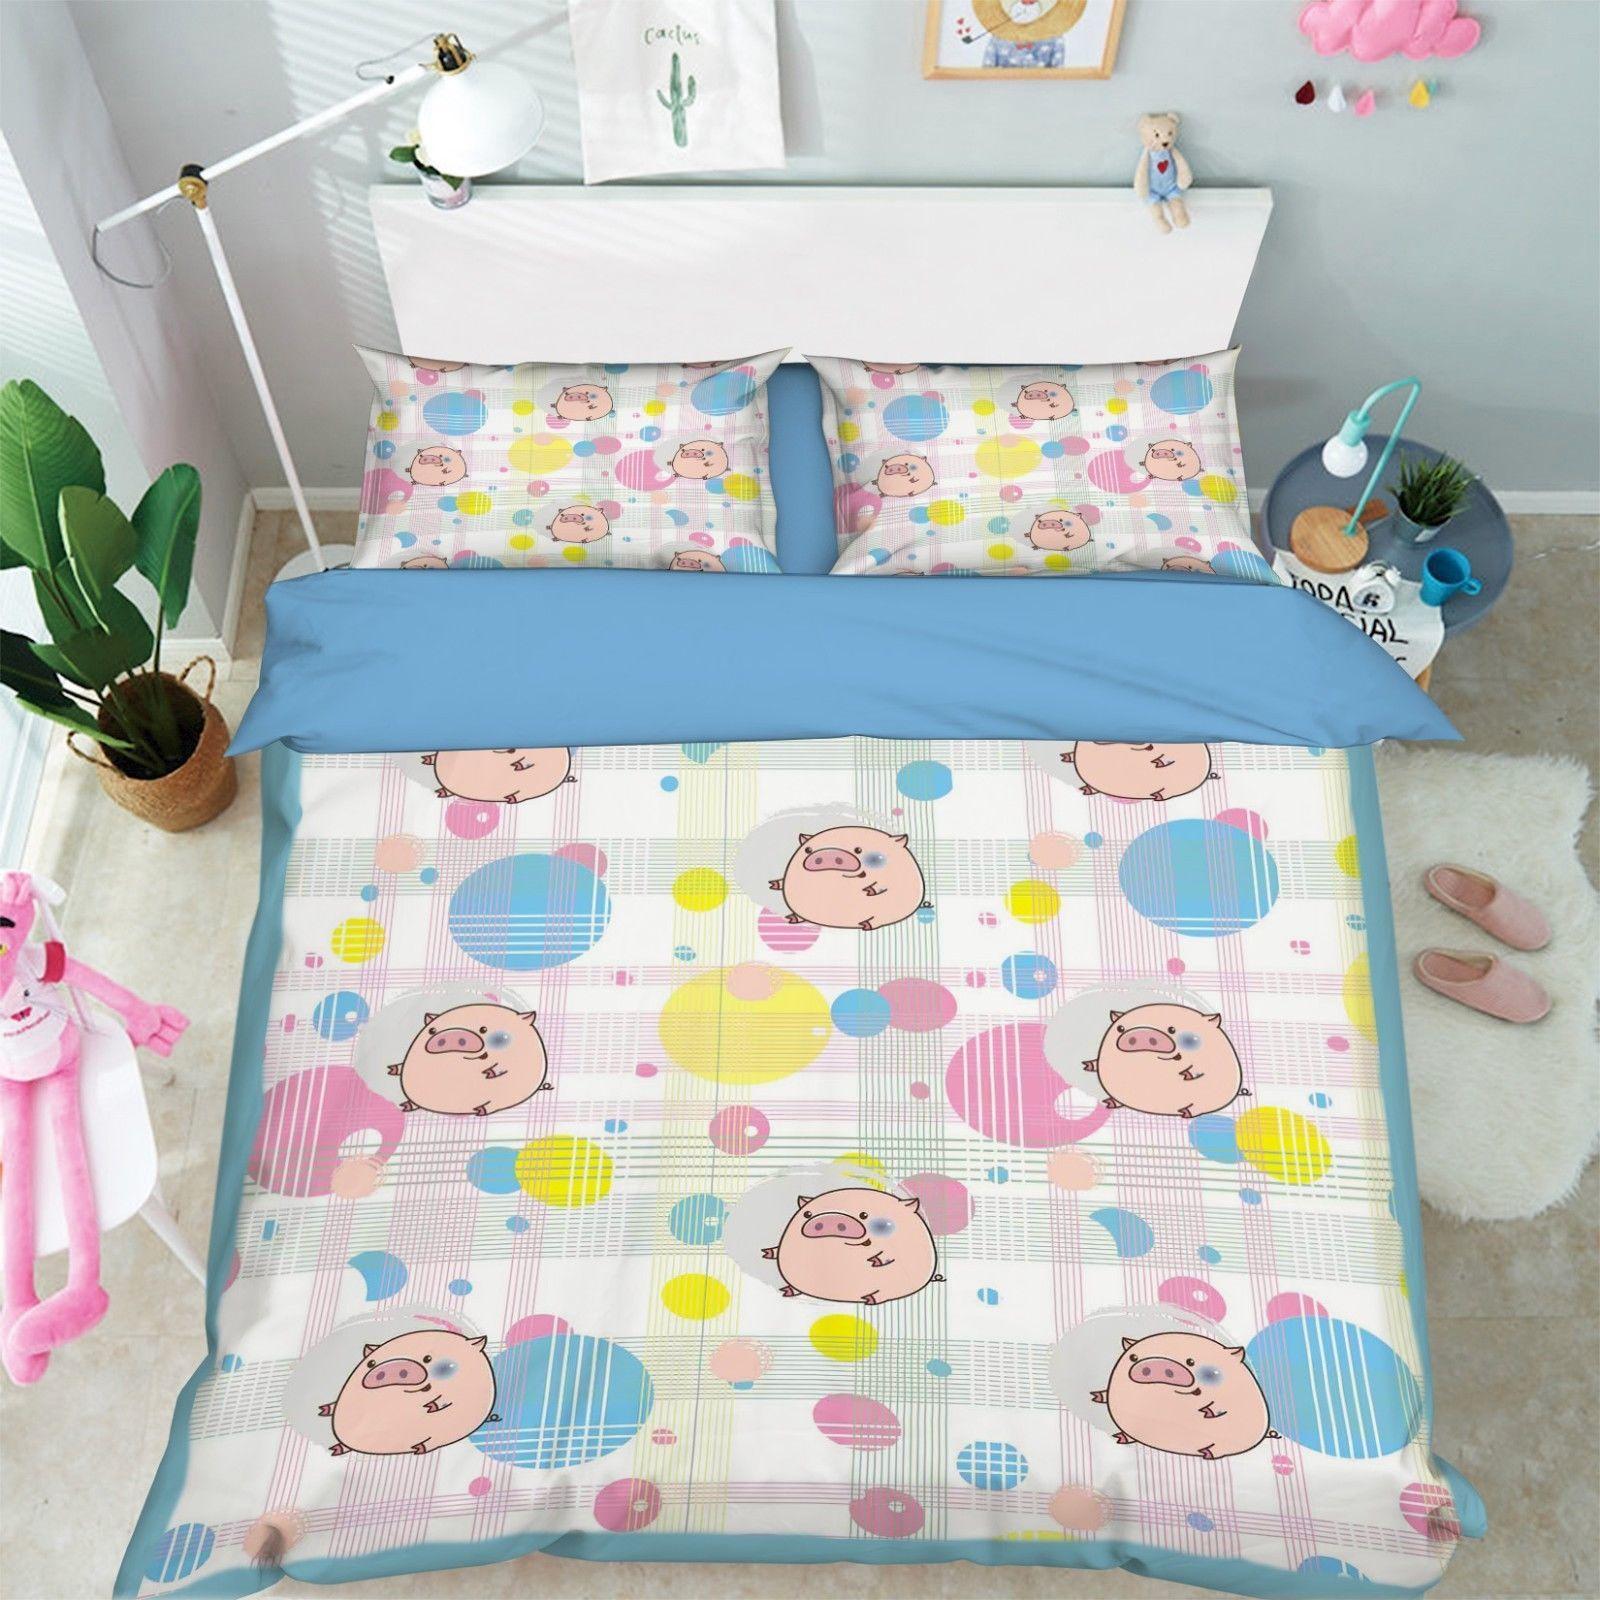 3D Cartoon Pig 1 Bed Pillowcases Quilt Duvet Cover Set Single Queen King Size AU - $90.04 - $122.20